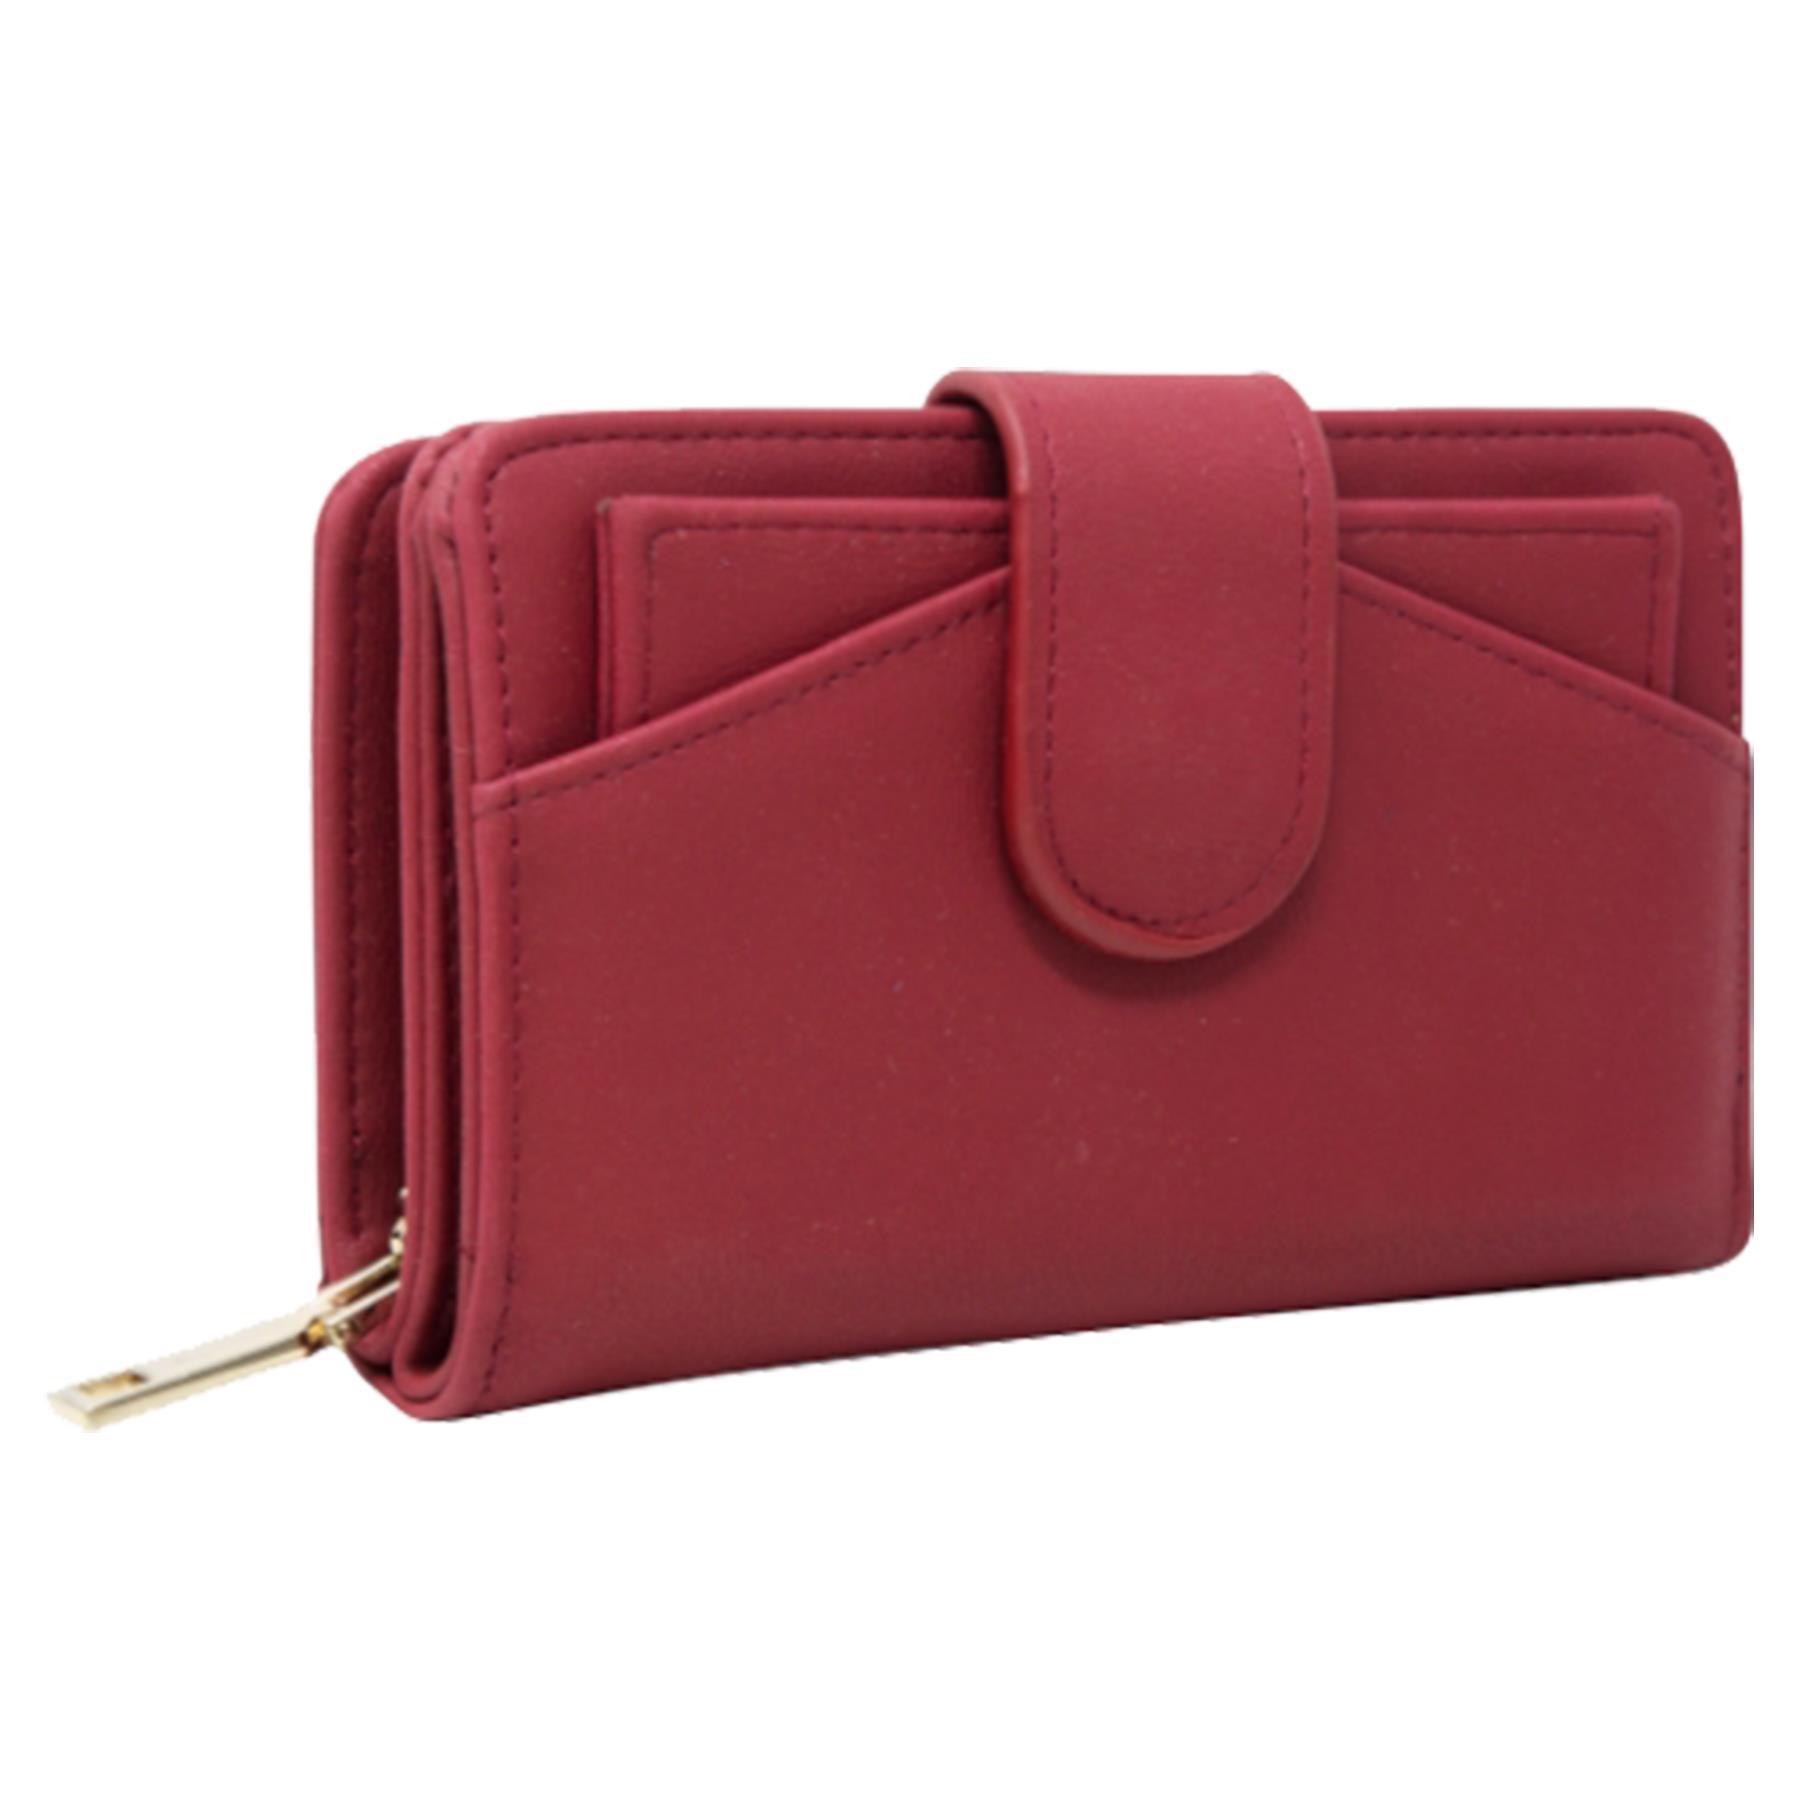 New-Ladies-Card-Slots-Zipped-Pocket-Faux-Leather-Basic-Wallet-Purse thumbnail 18